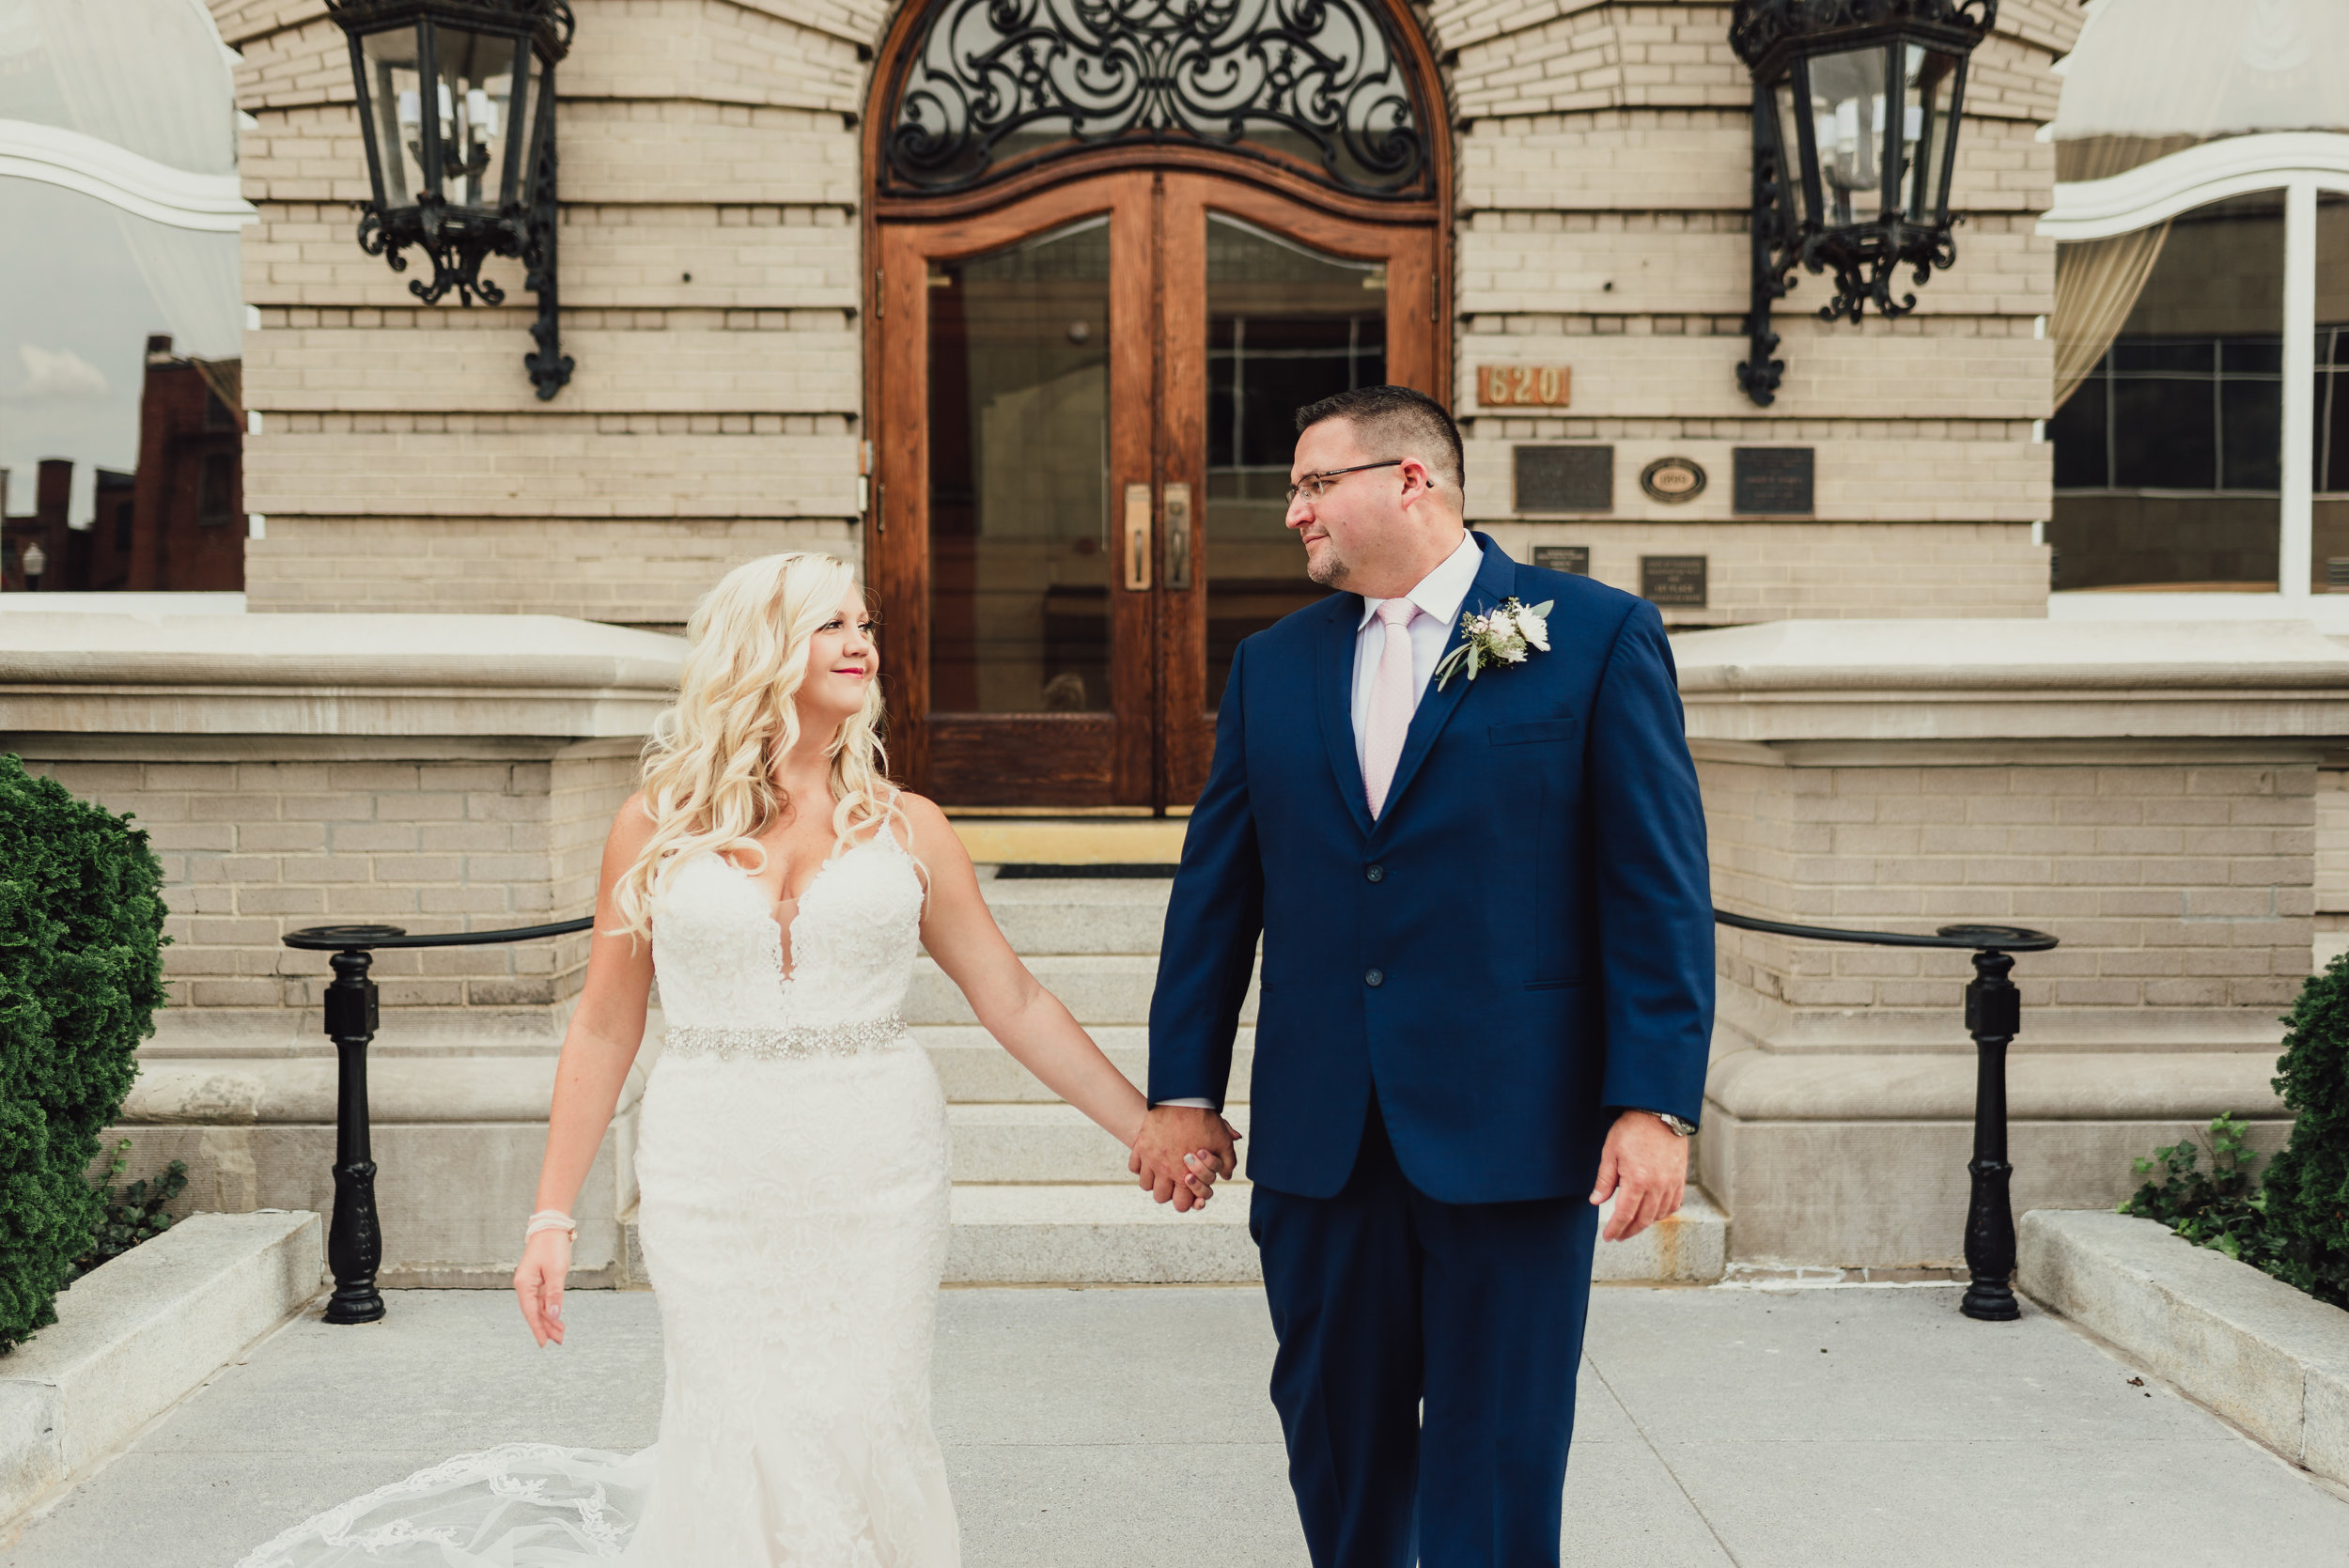 east-tn-wedding-photographer-tennessee-elopement-photographer-kingsport-tn-wedding-photographer (254 of 1001).jpg